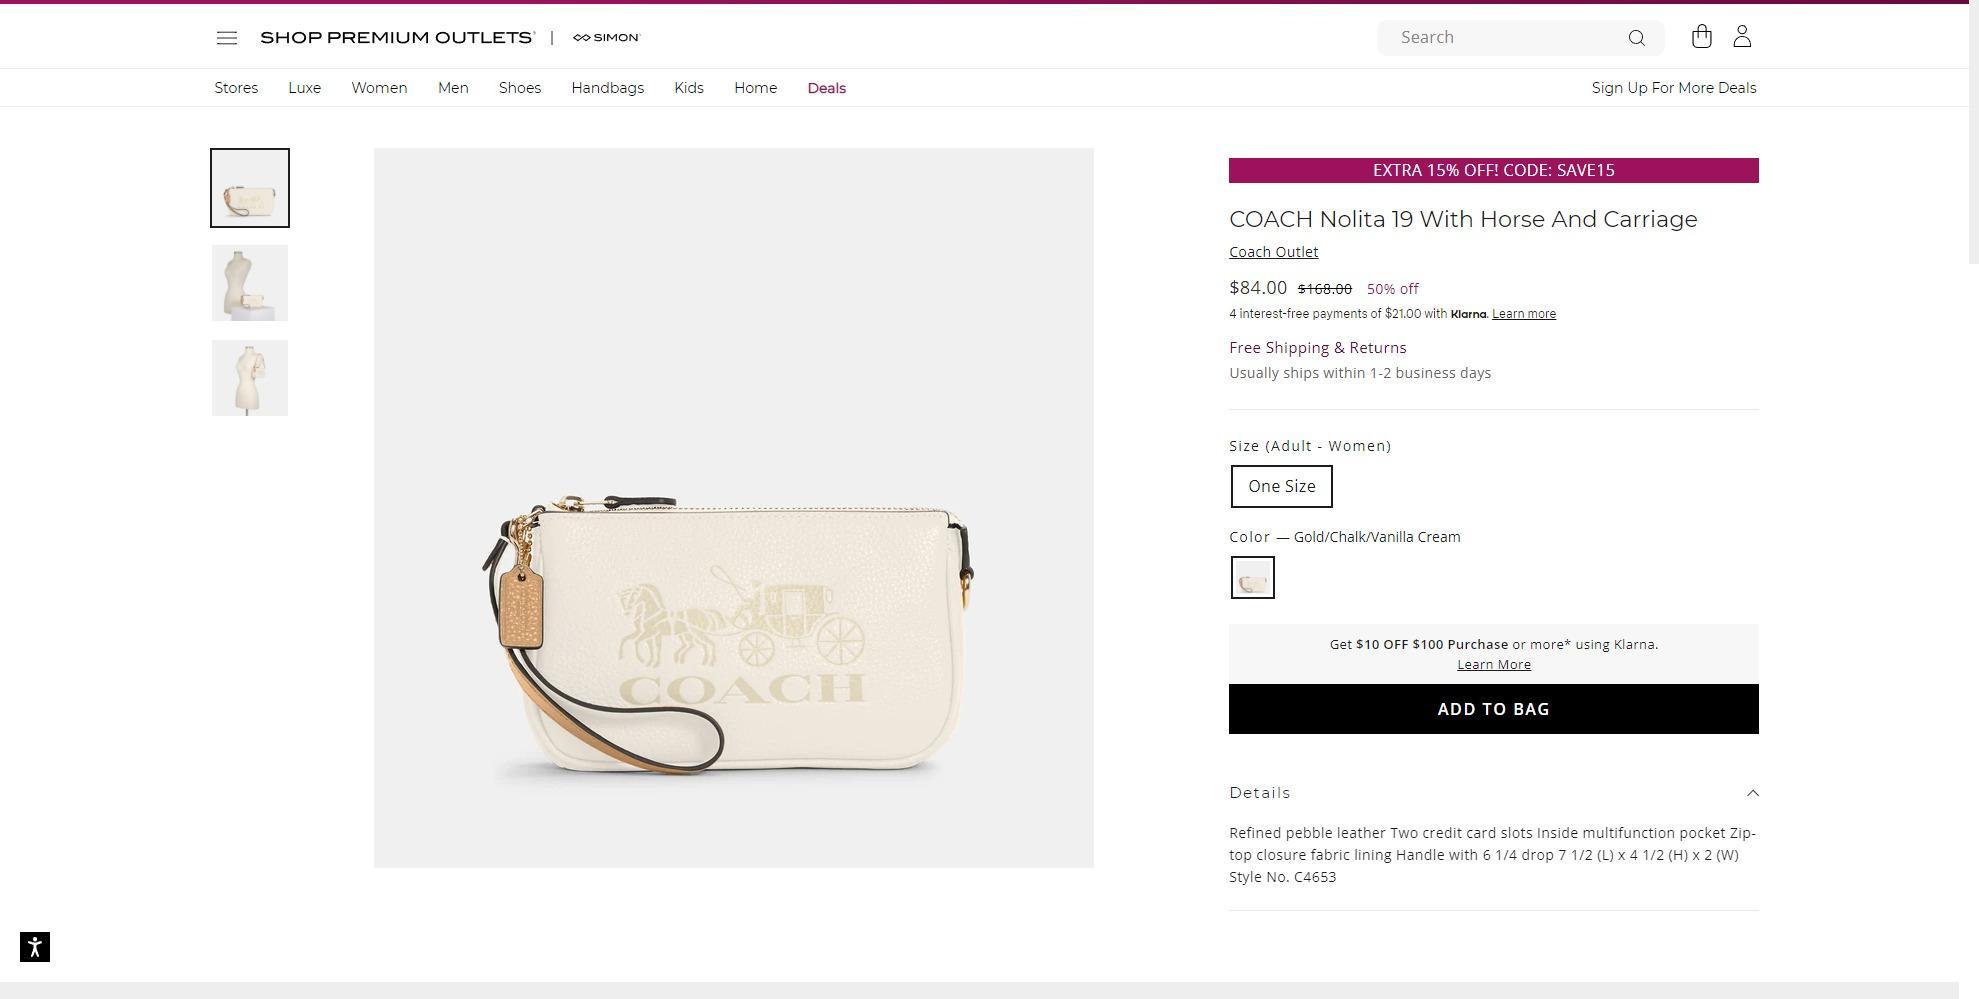 Shop Premium Outlet精选款式85折 订单满50美元免邮